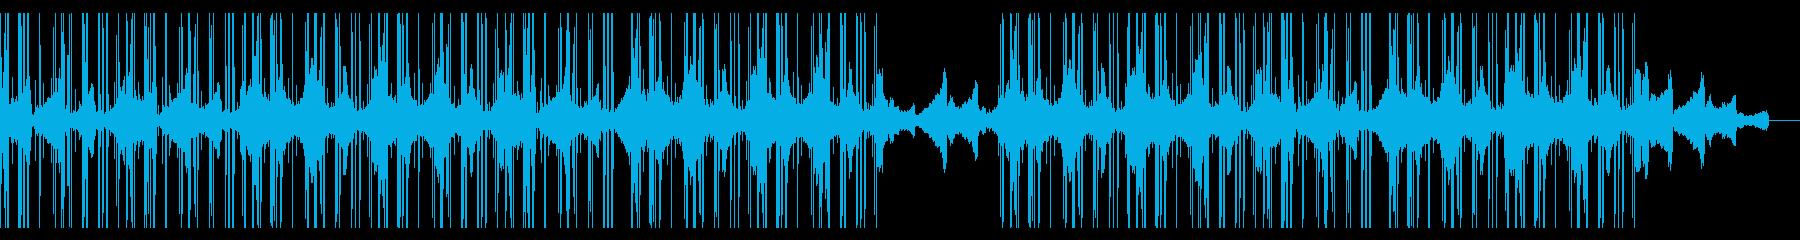 Lofi Hiphop 睡眠用チルアウトの再生済みの波形